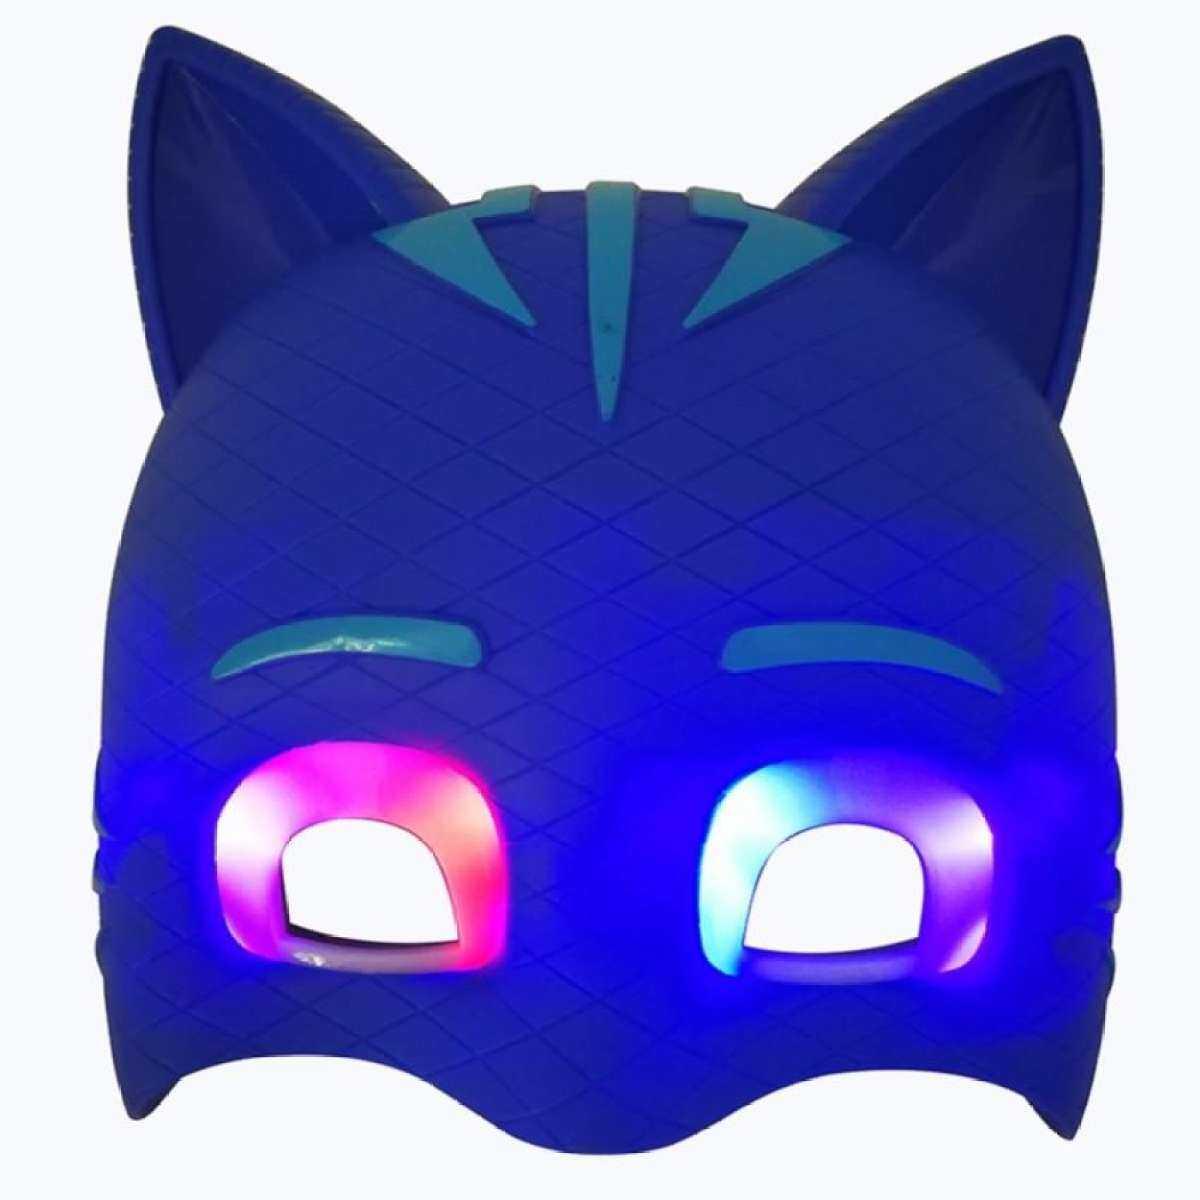 Pjmasks Hero Mask Catboy Luna Girl Gekko Mask with Party for Festival  Birthday Toy LED Gift Light Halloween